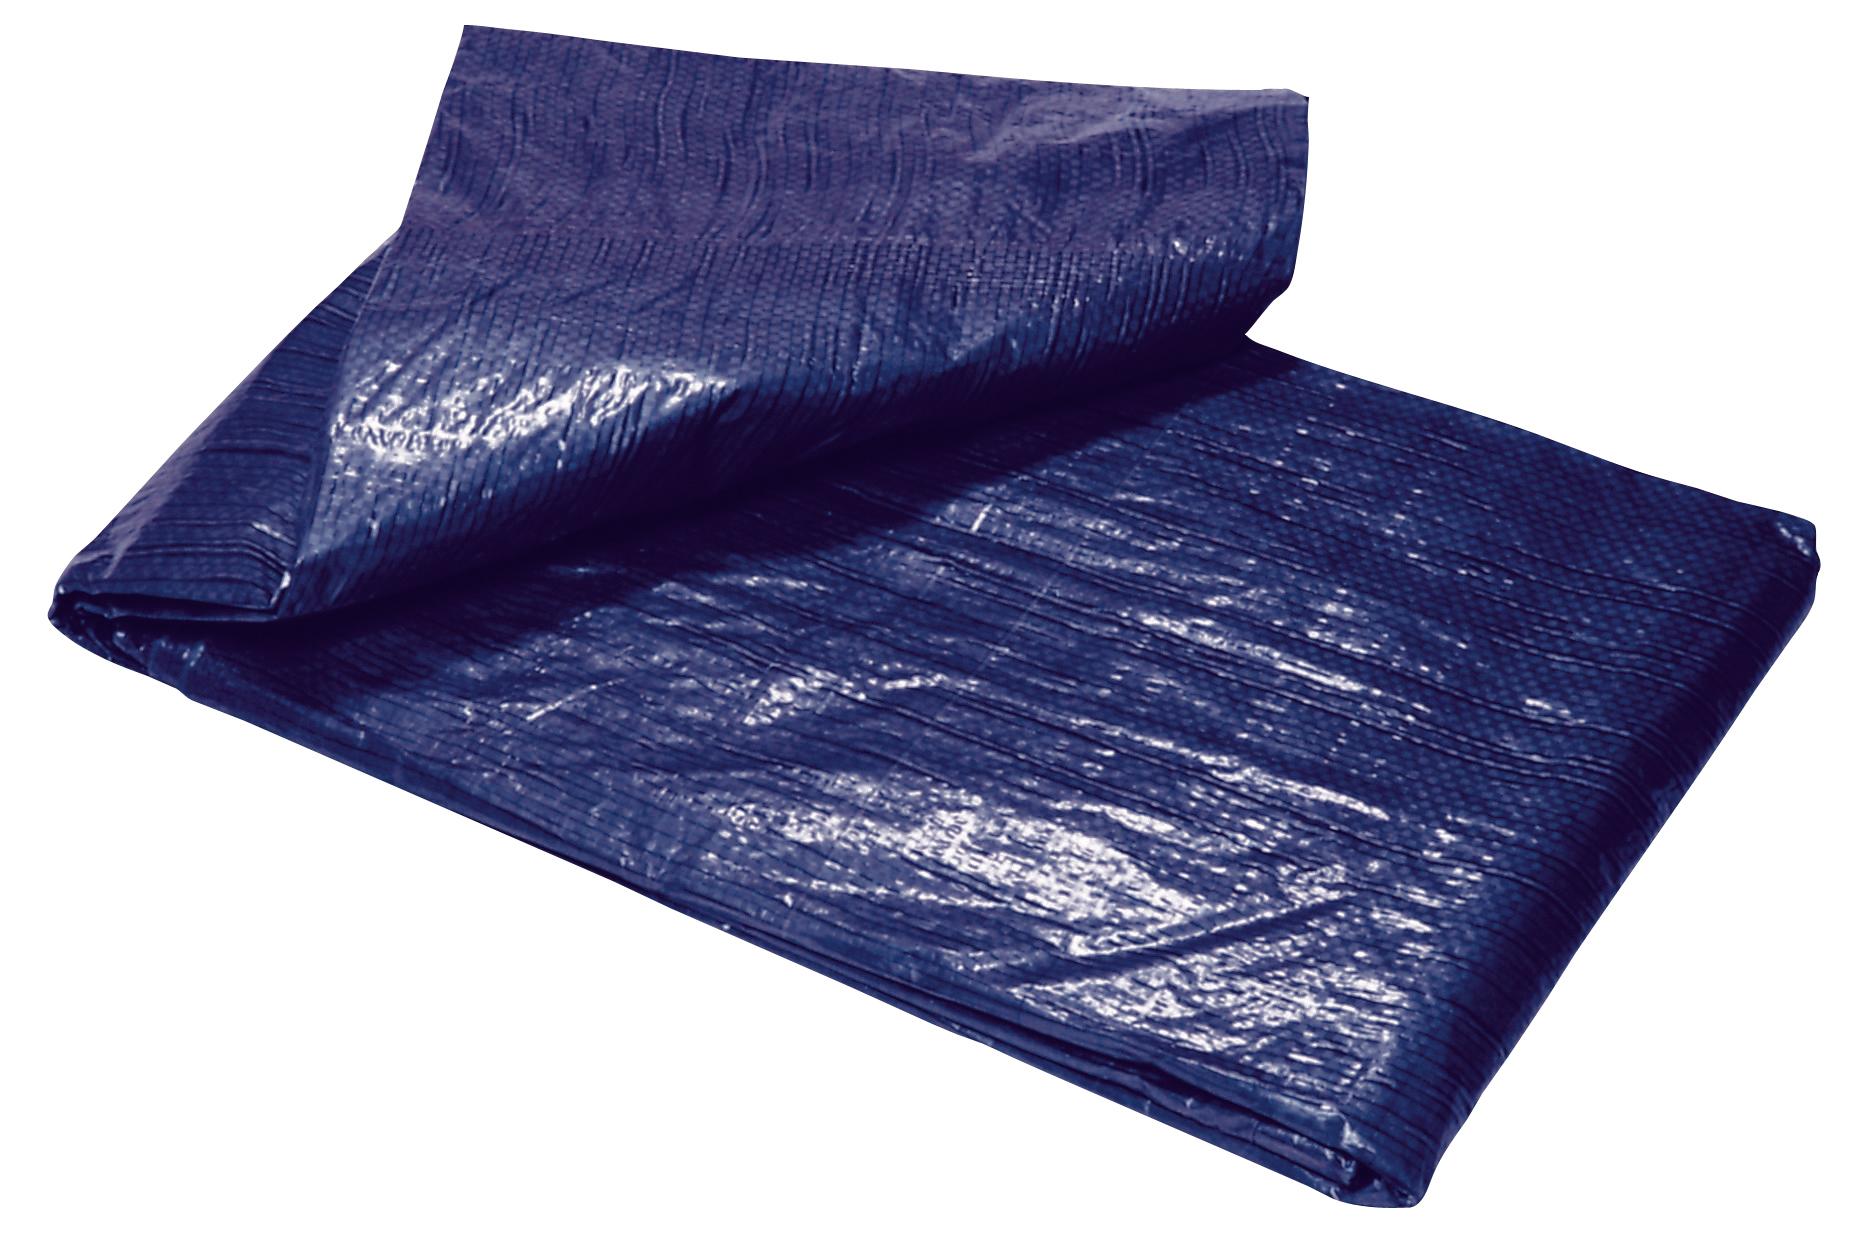 Plachta Tarpaulin Standard 08x12, prekrývacia, 80 g/m2, modrá